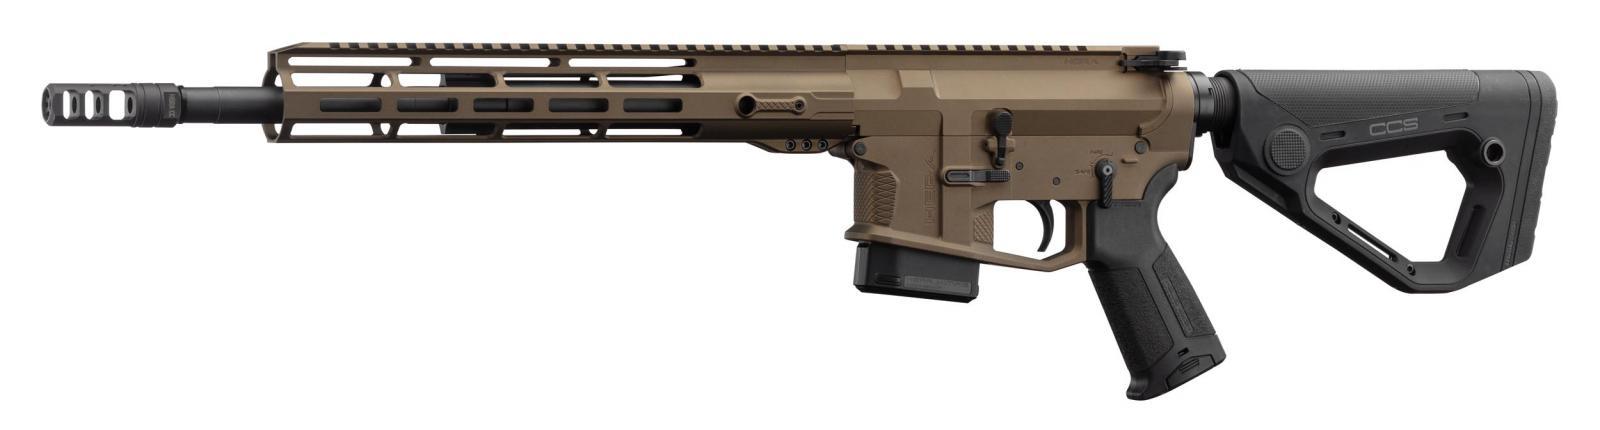 Carabine type AR15 HERA ARMS 15TH SRB Bronze